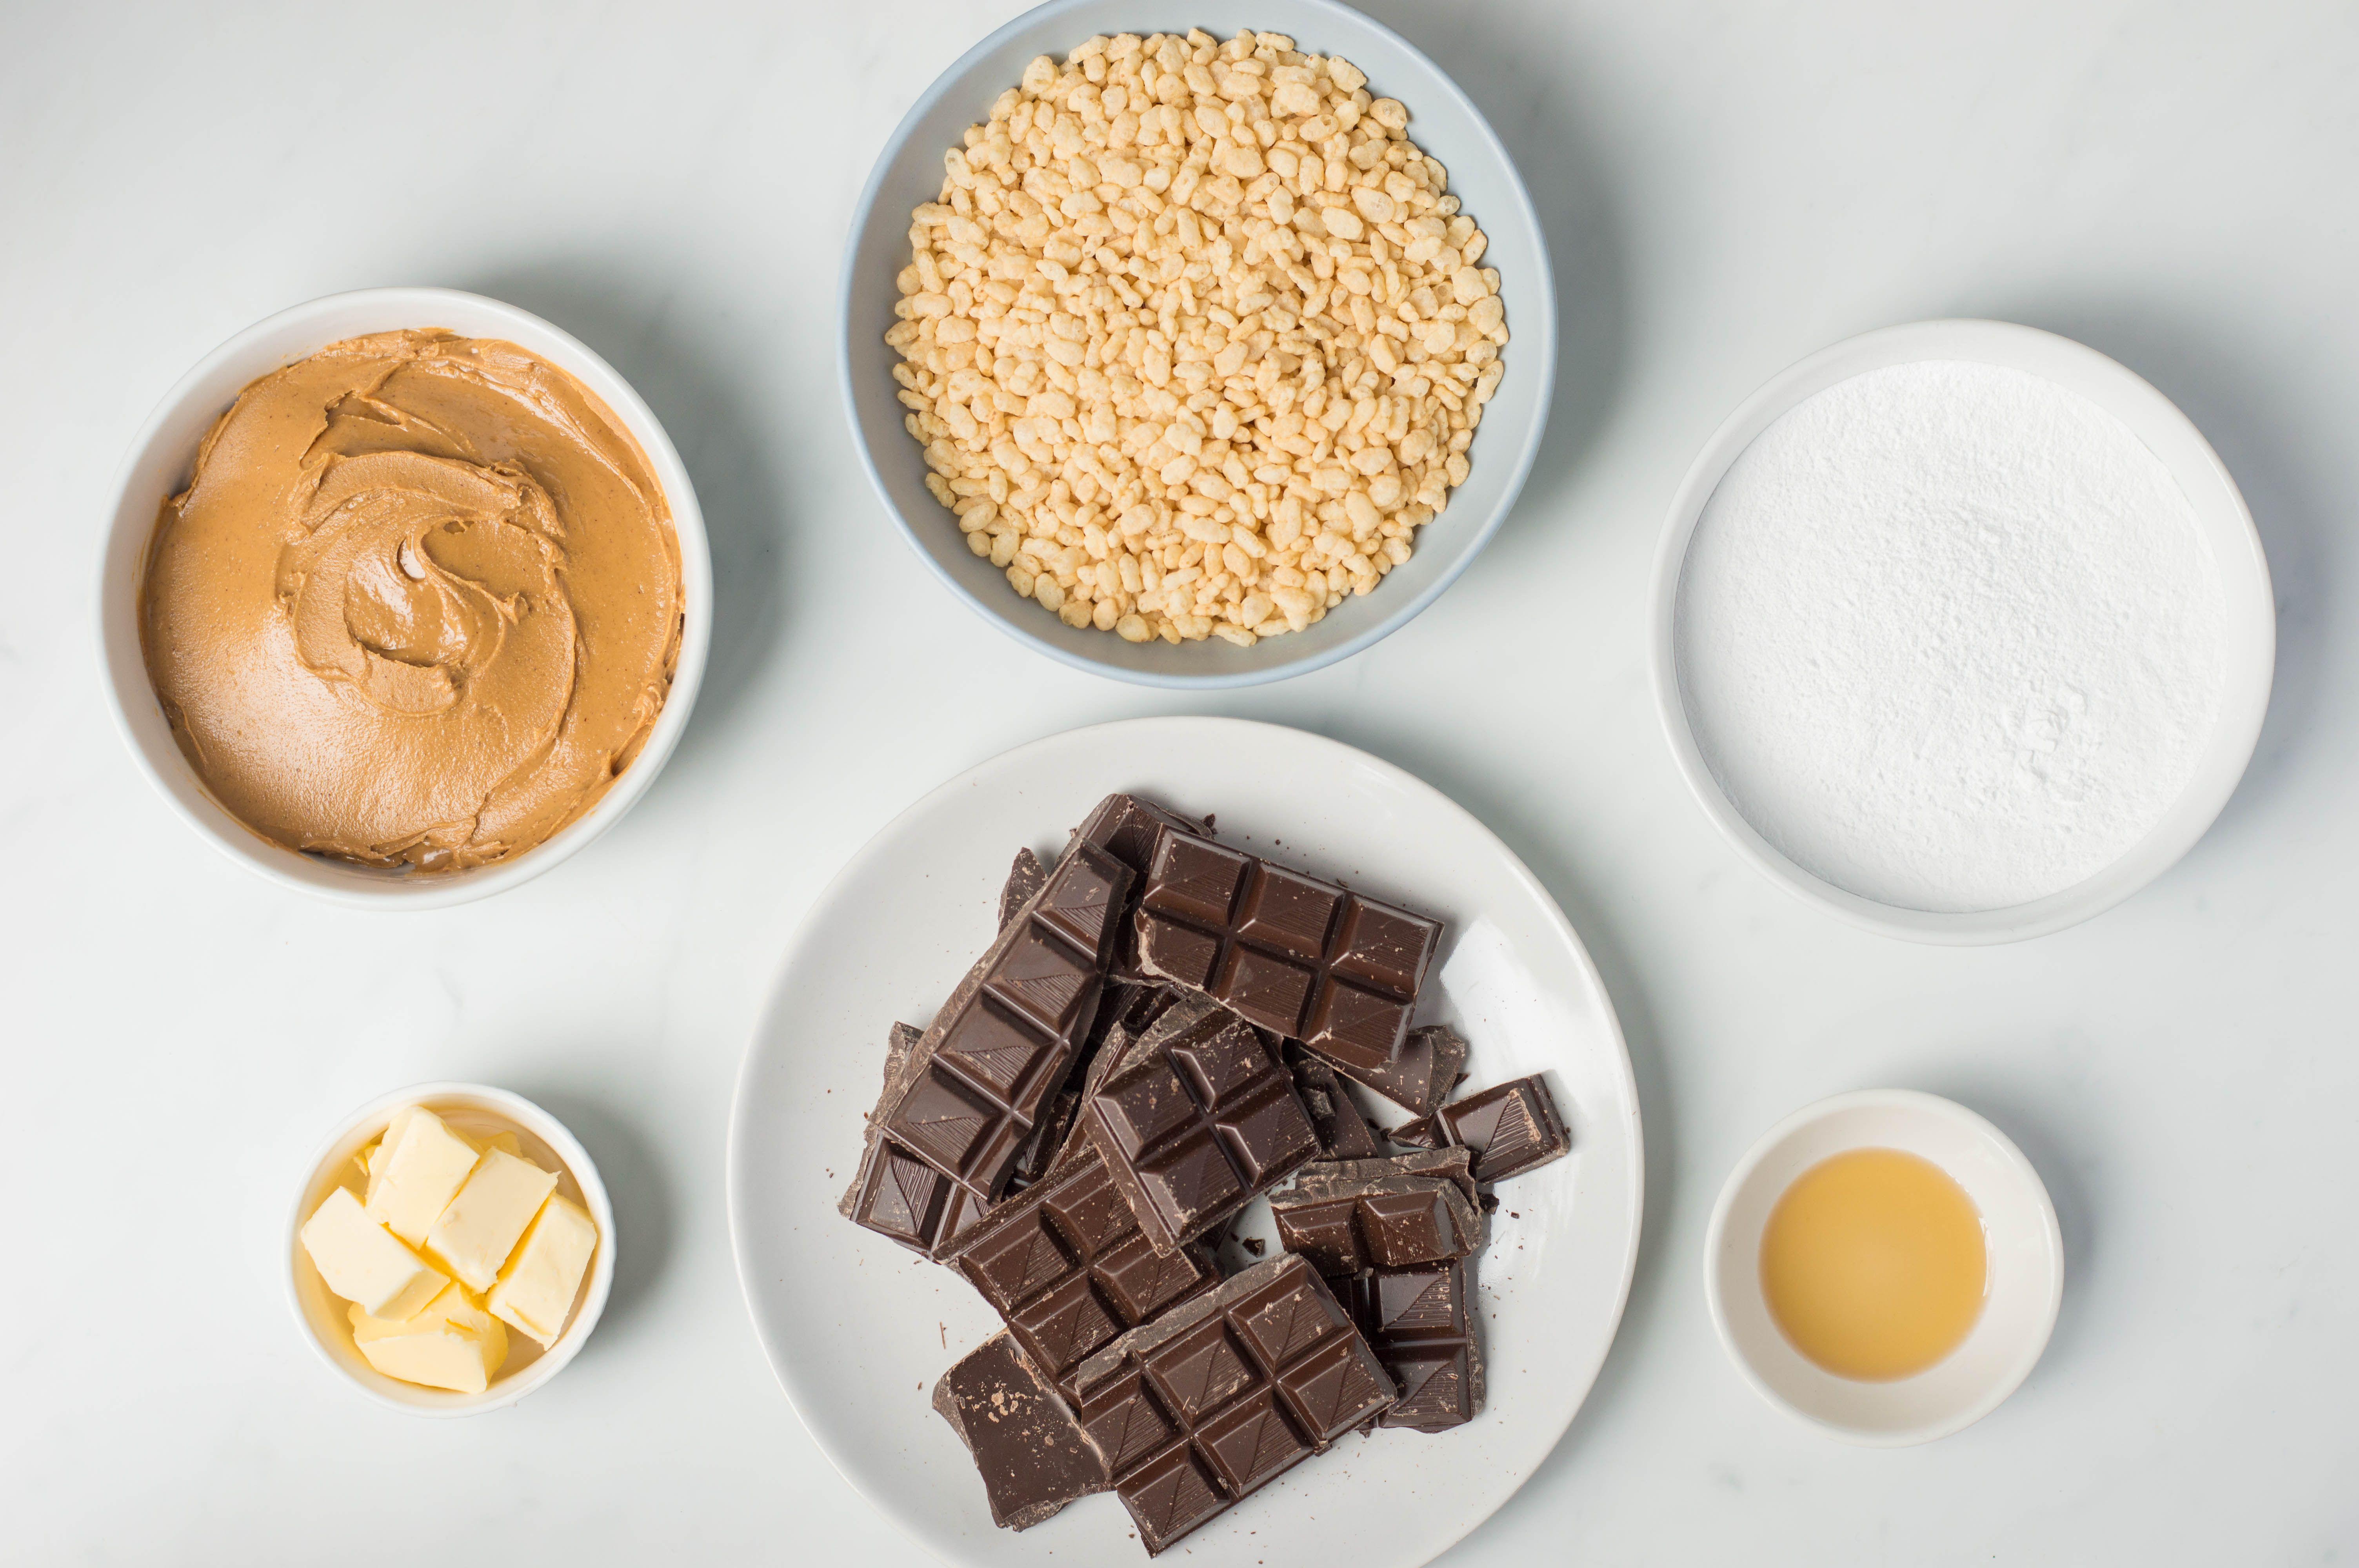 Ingredients for crunchy buckeyes